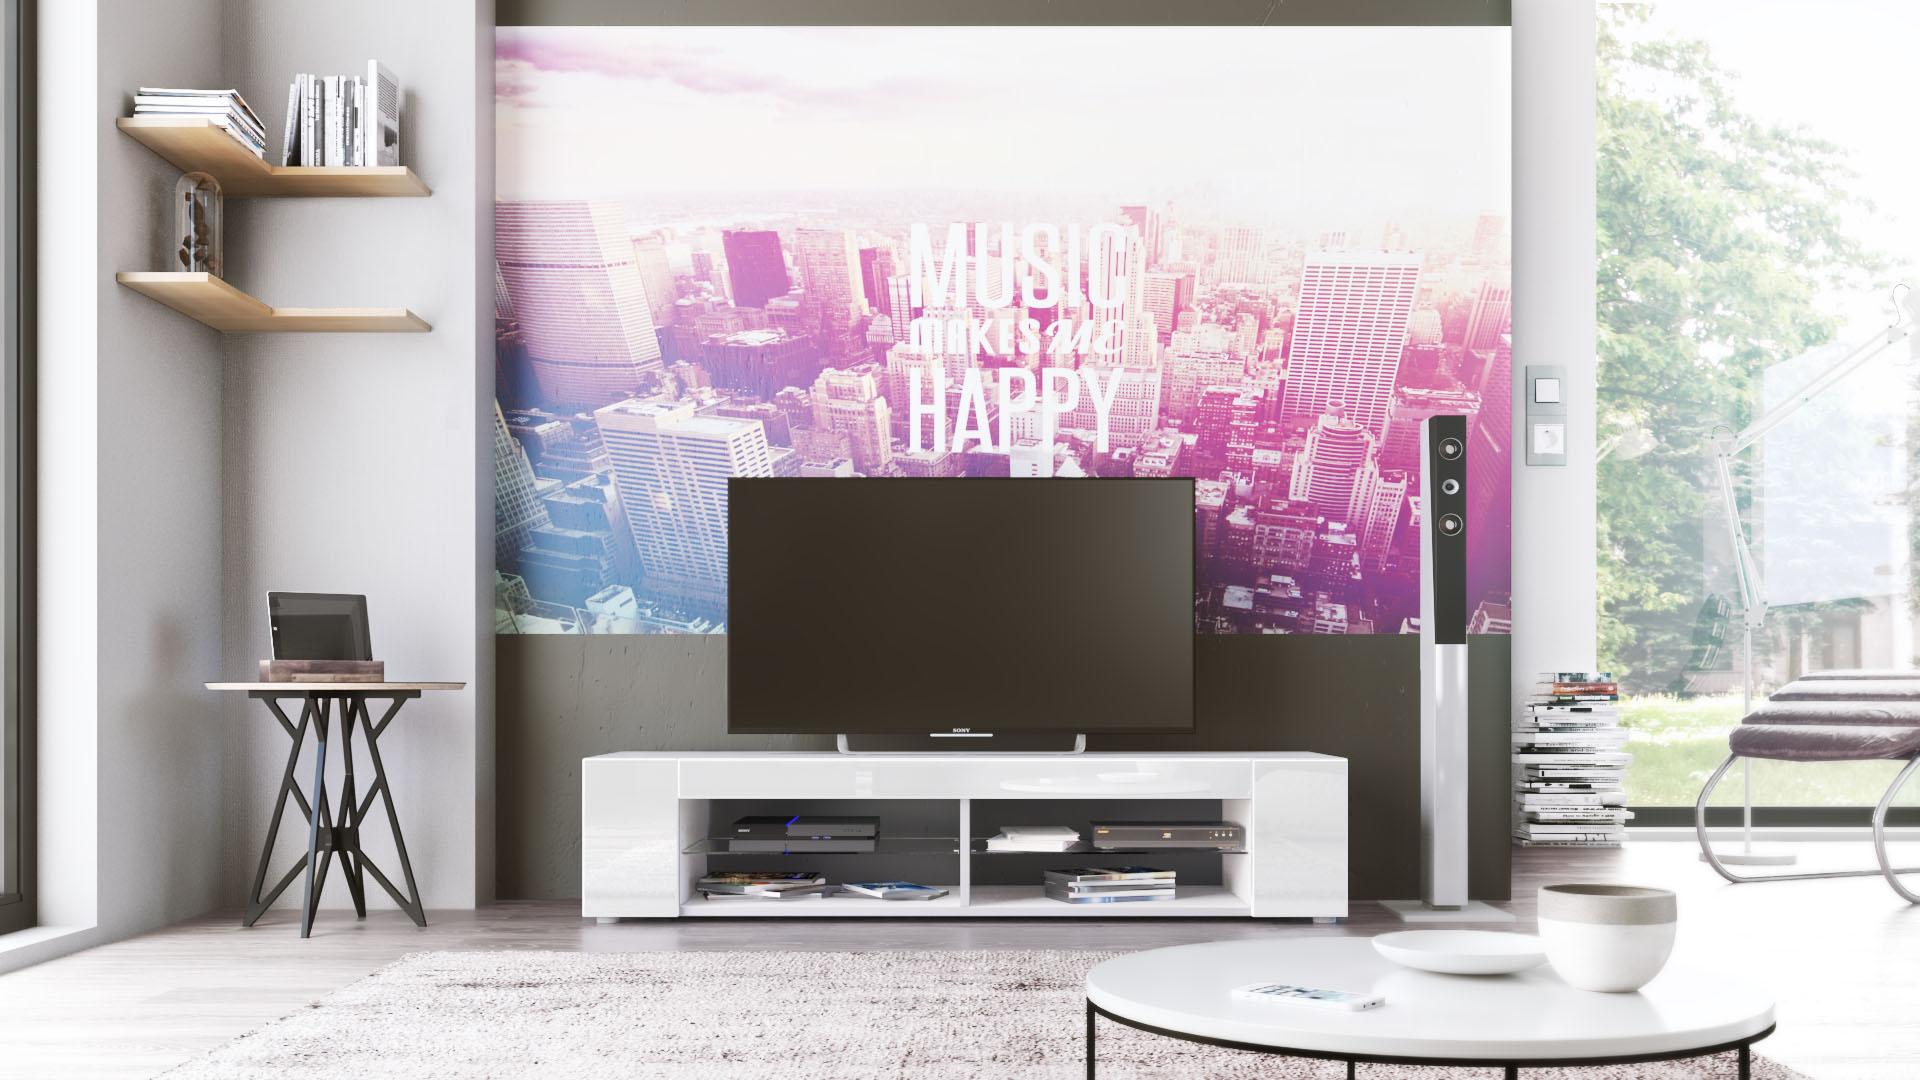 Ebay Meubles Ebay Meuble Tv Meuble T L Meuble Salle De Bain Ebay  # Armoire Basse Tele